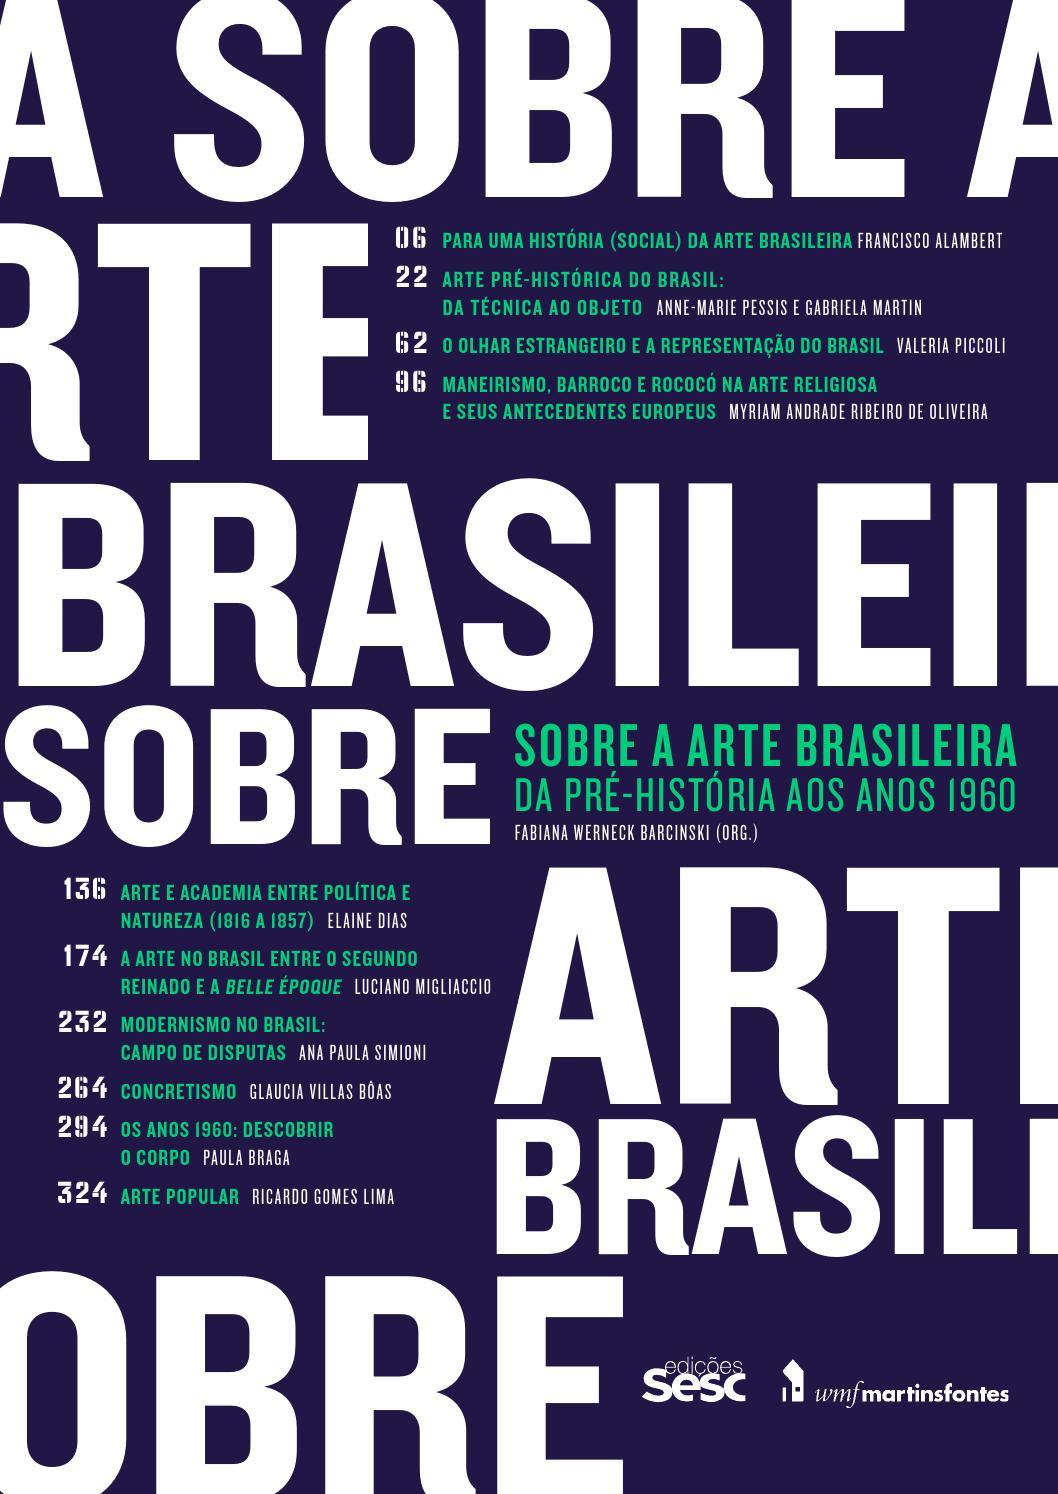 Sobre a arte brasileira da pr histria aos anos 1960 by edies sobre a arte brasileira da pr histria aos anos 1960 by edies sesc so paulo issuu fandeluxe Gallery